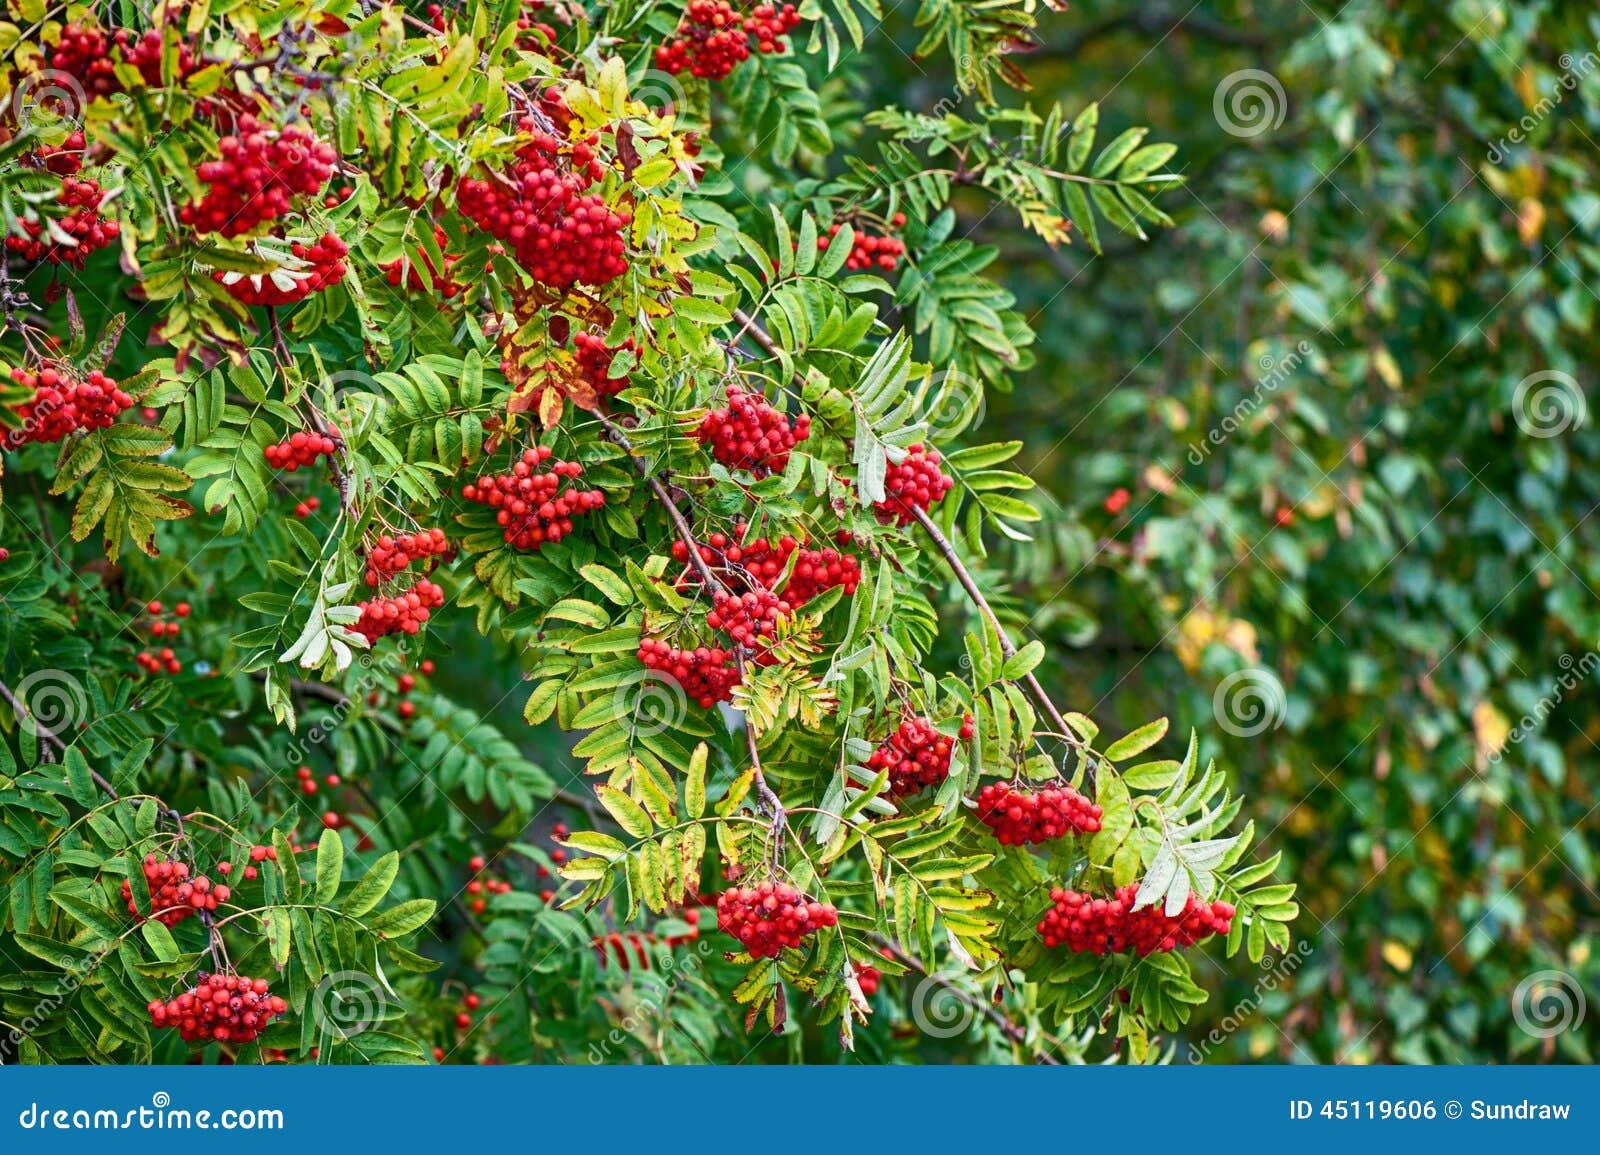 Arbre a baie rouge homeezy - Arbre feuille rouge fruit rouge ...